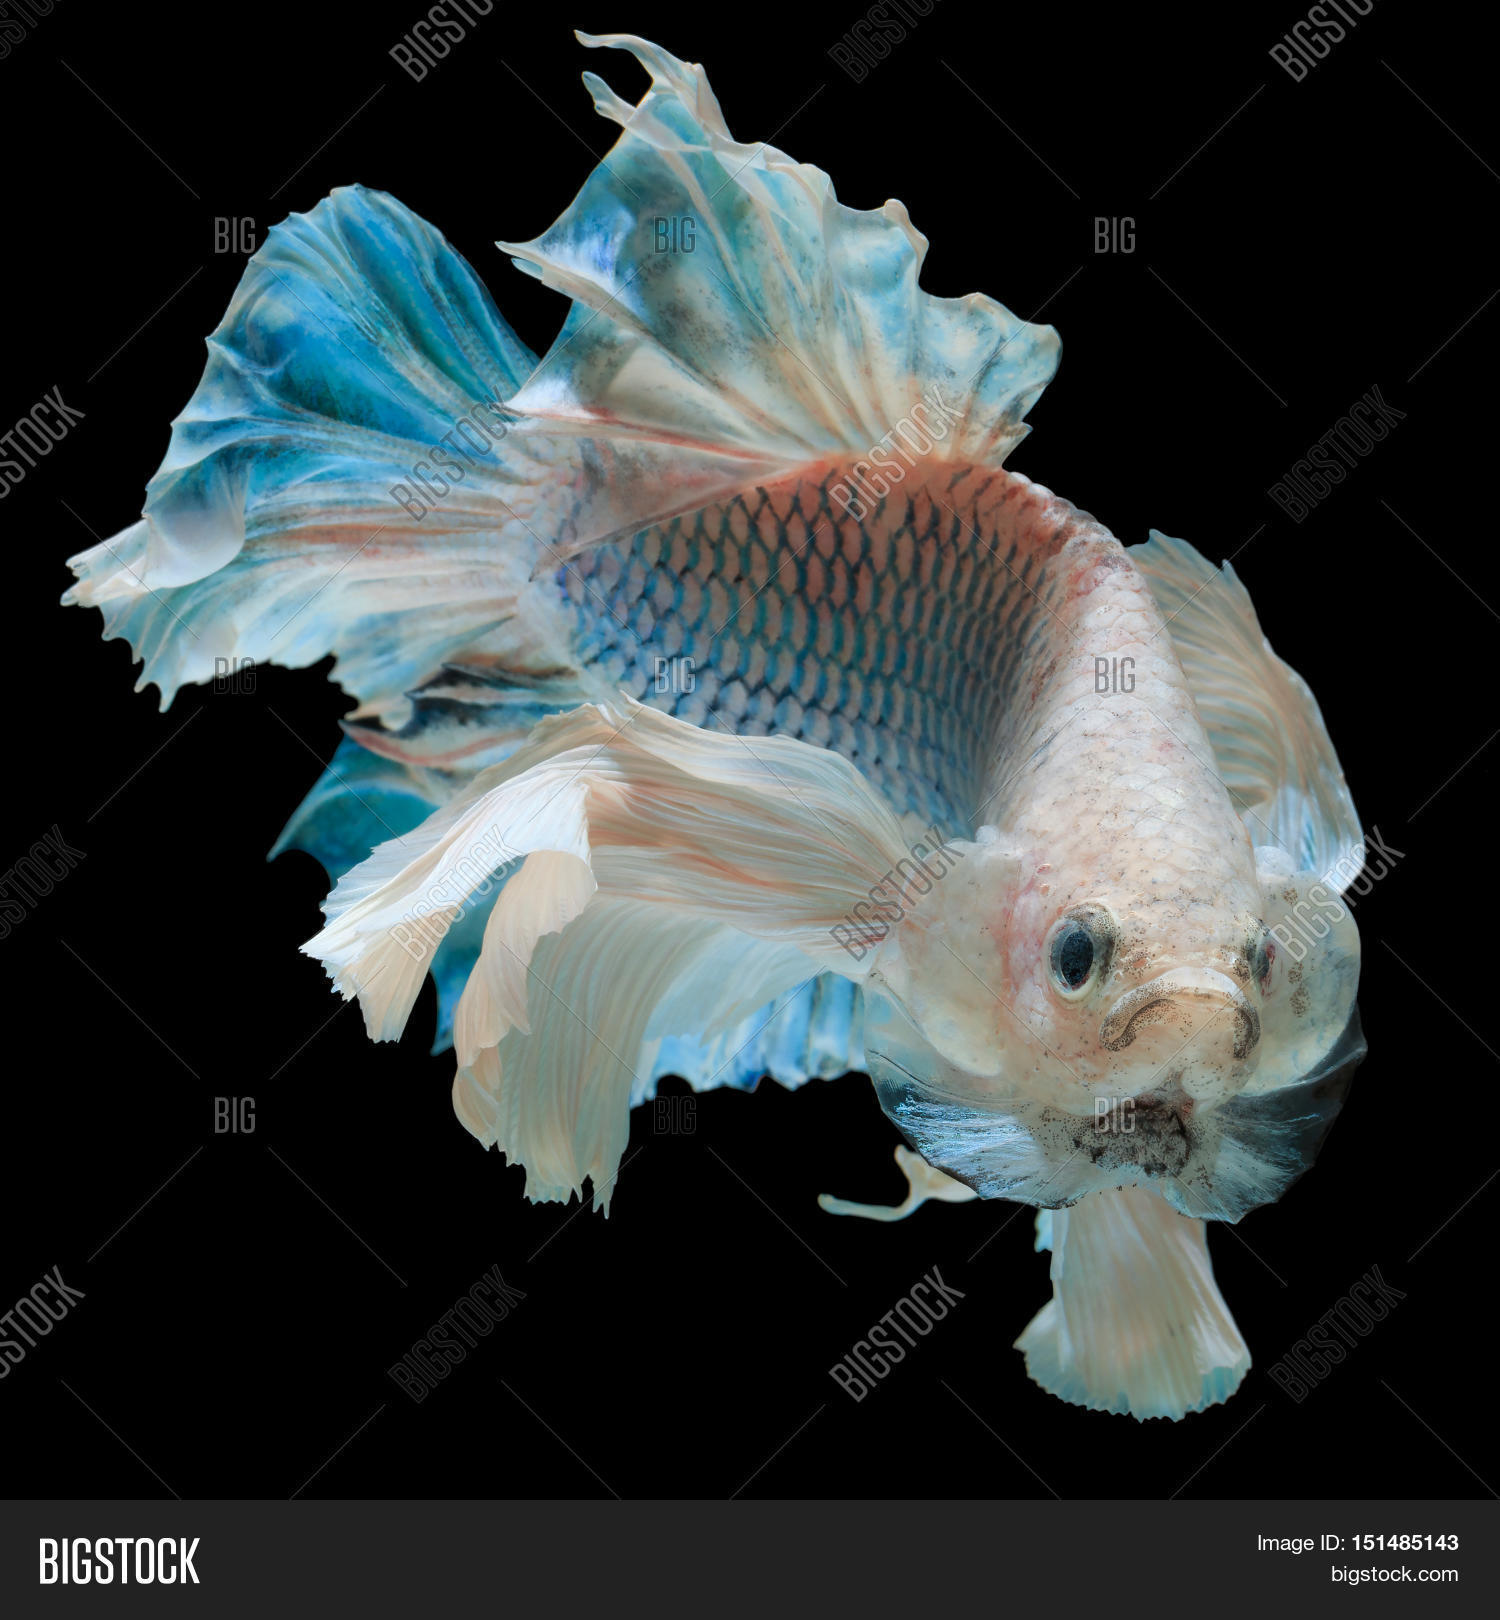 Siamese Betta Fish | Betta Fish Fighting Fish Siamese Image Photo Bigstock